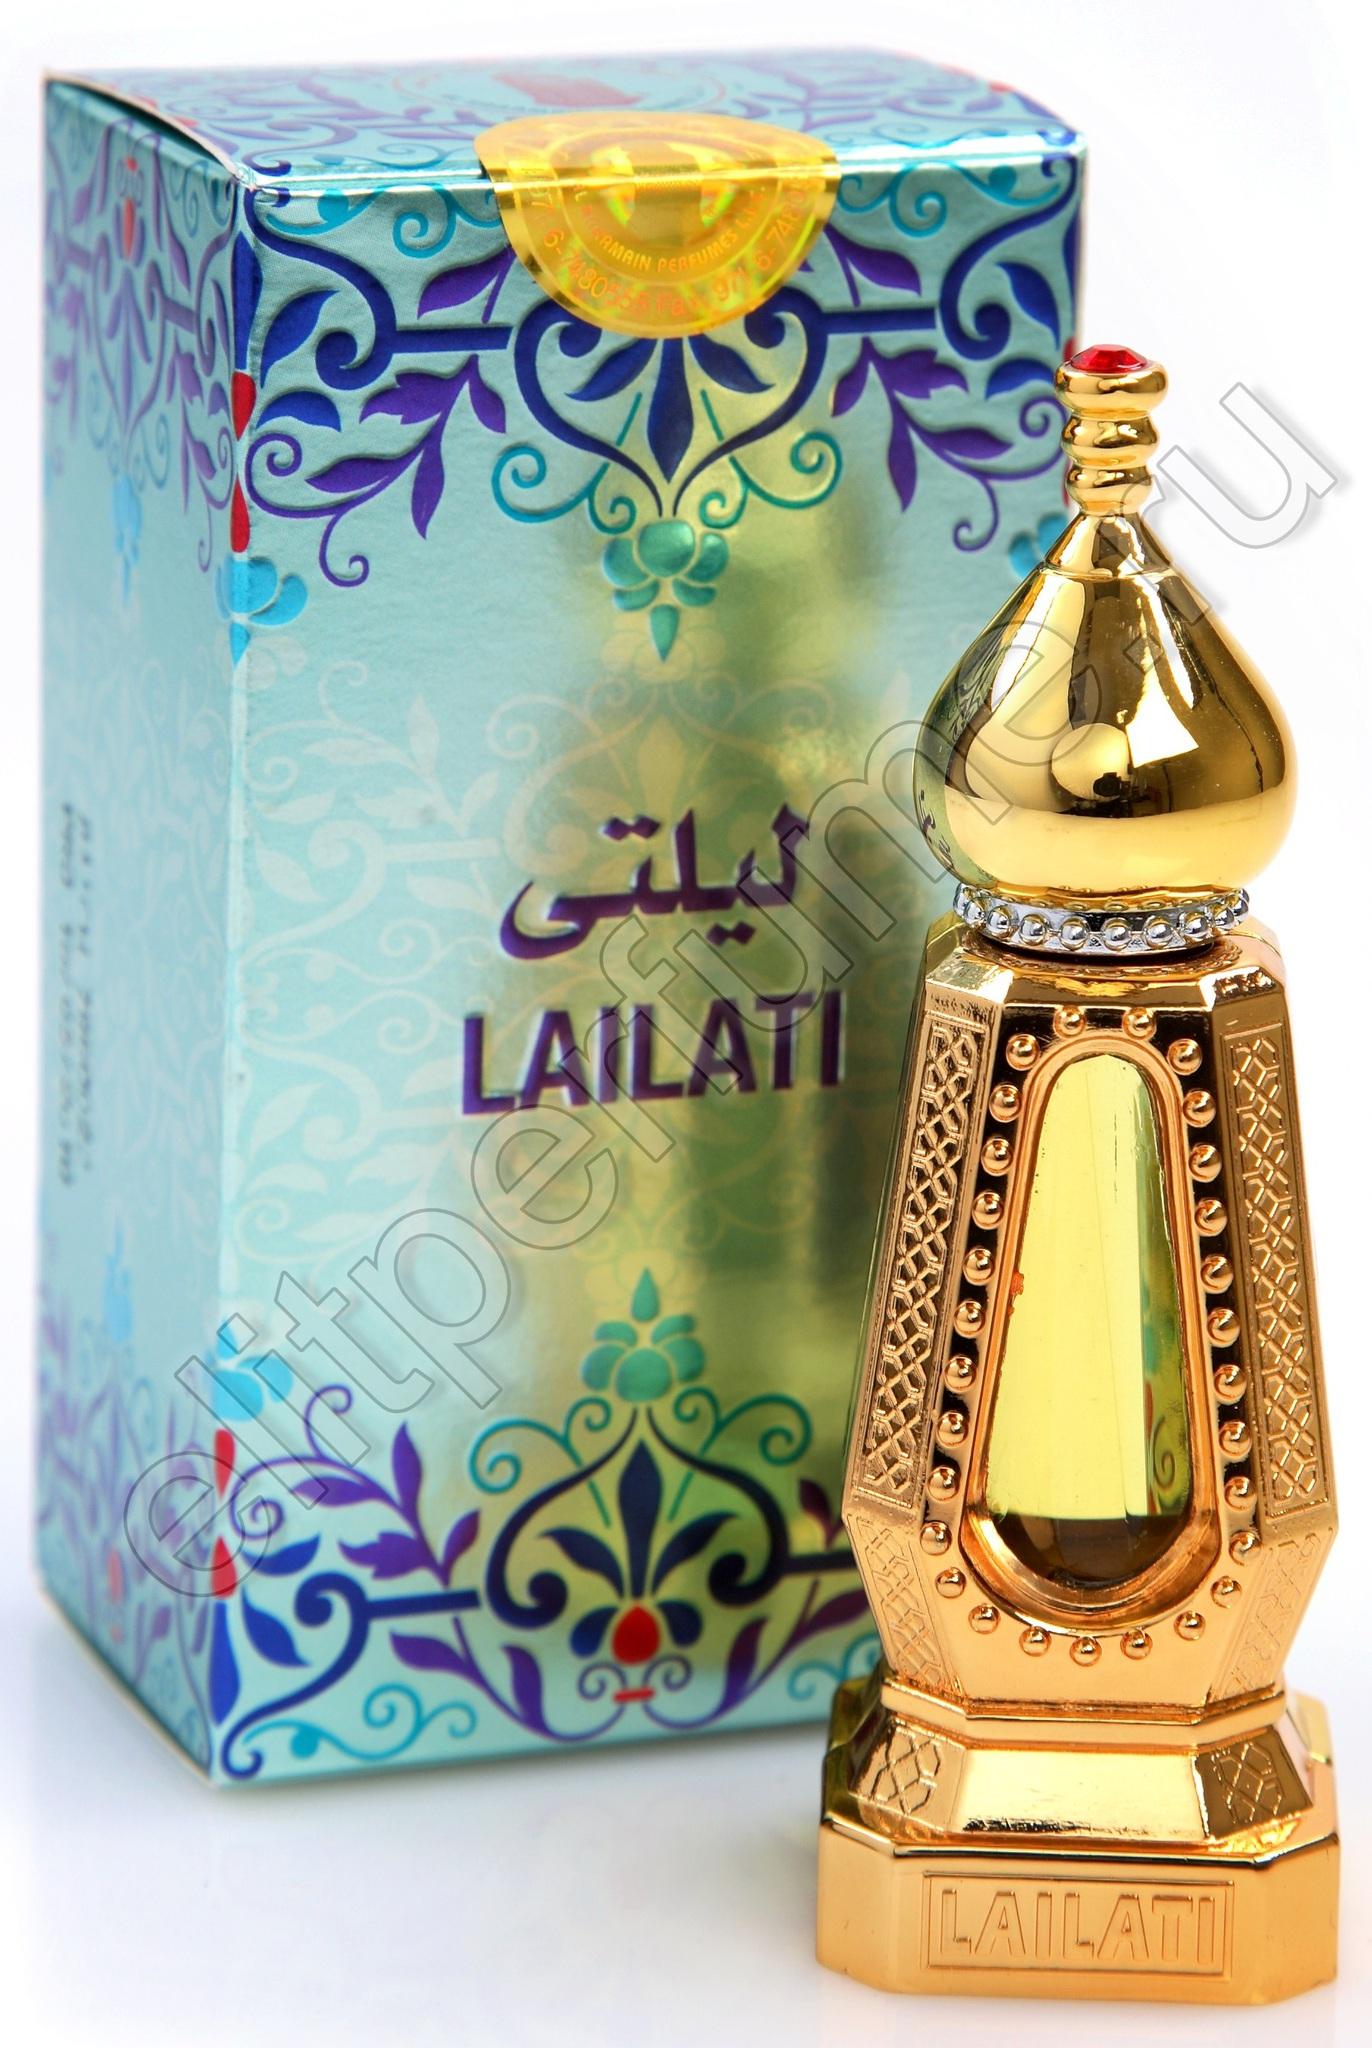 Пробники для духов Лайлати Lailati 1 мл арабские масляные духи от Аль Харамайн Al Haramin Perfumes